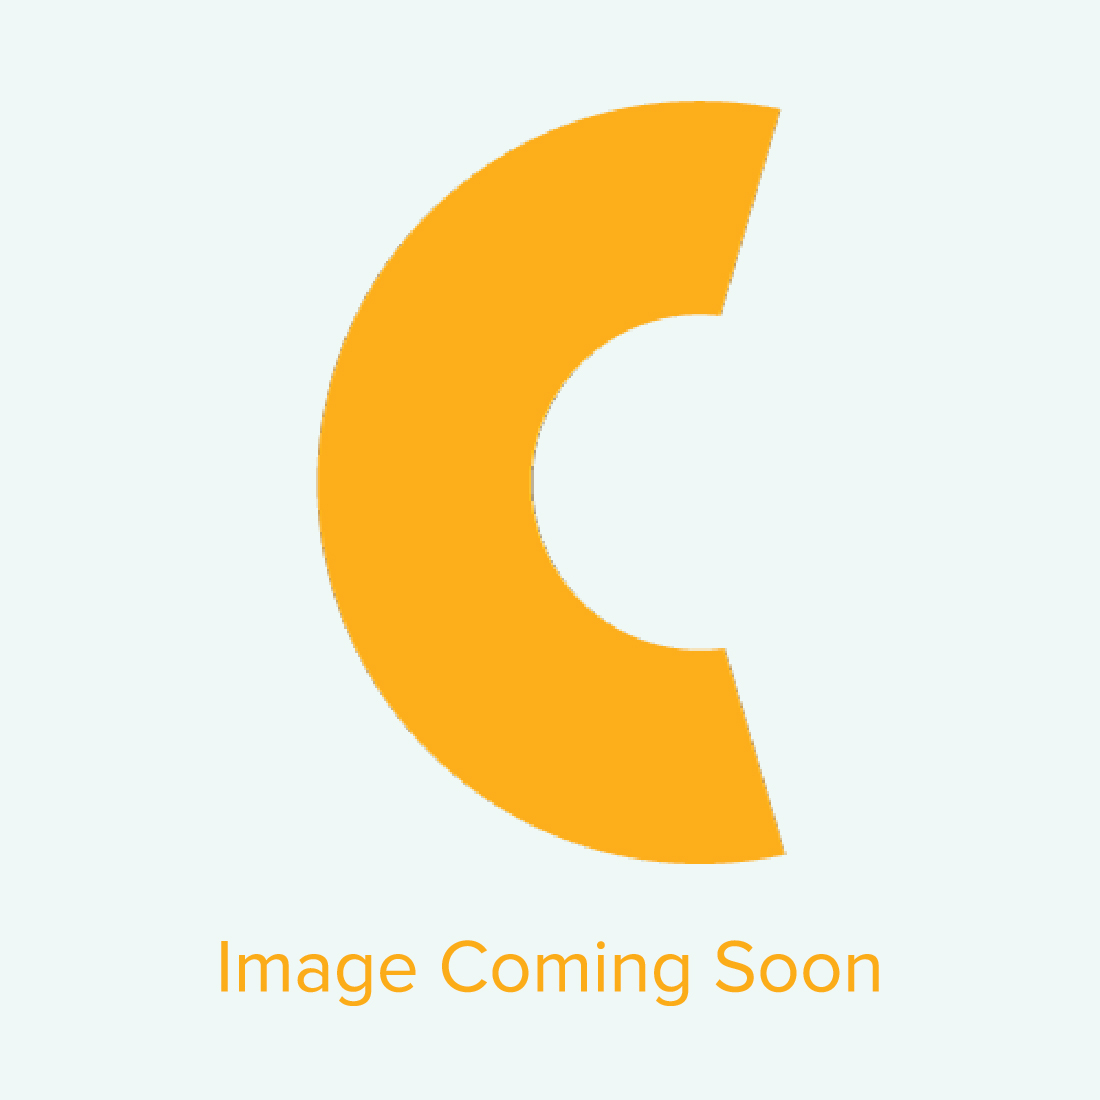 "Hotronix STX20 Auto Opening Digital Clamshell Heat Press Machine - 16"" x 20"""